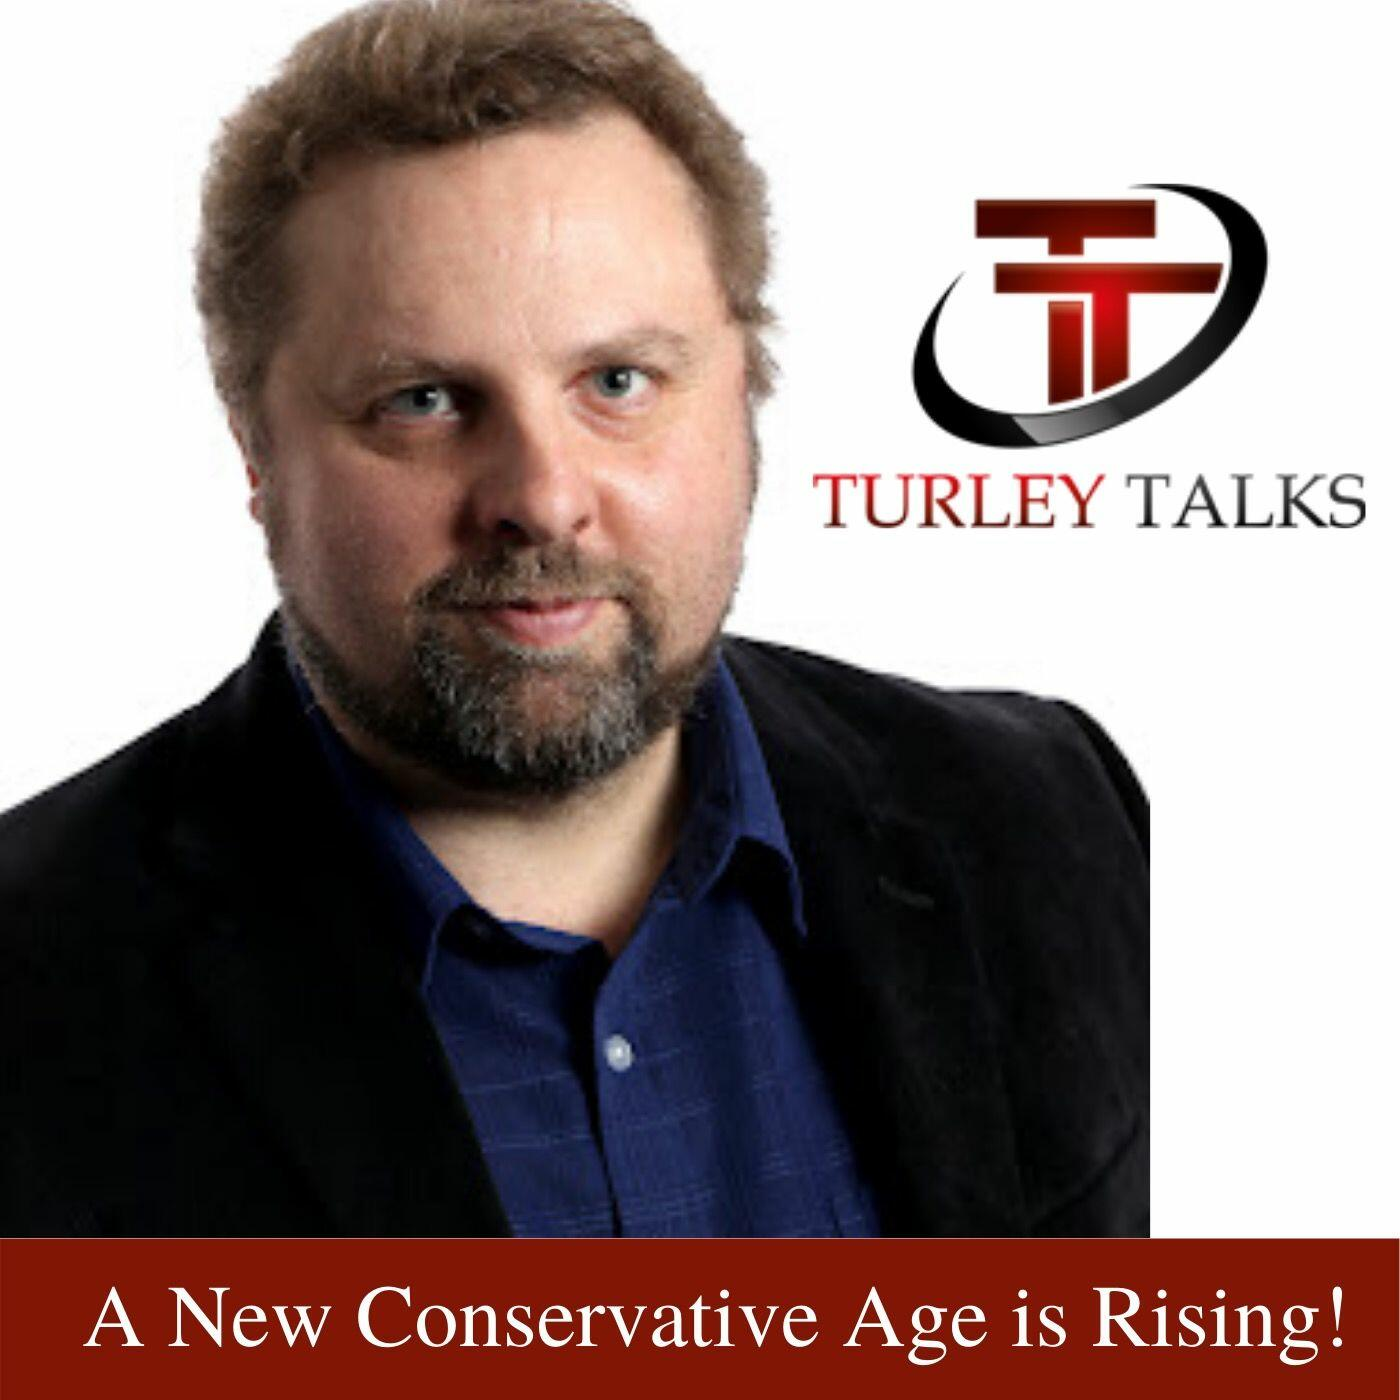 Turley Talks